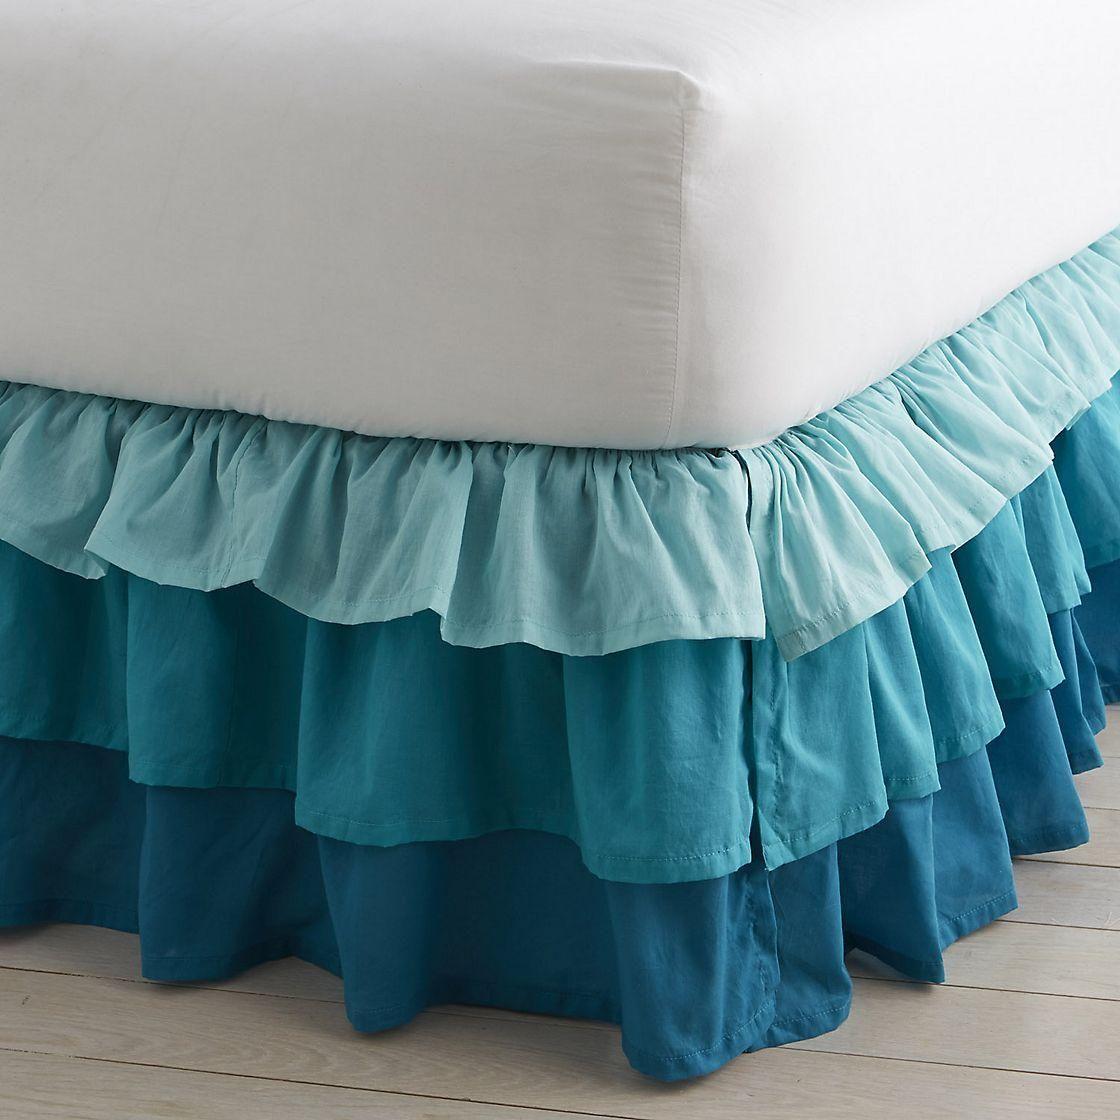 Tiered Bedskirt Bedroom Decor Room Decor Bedroom Colors